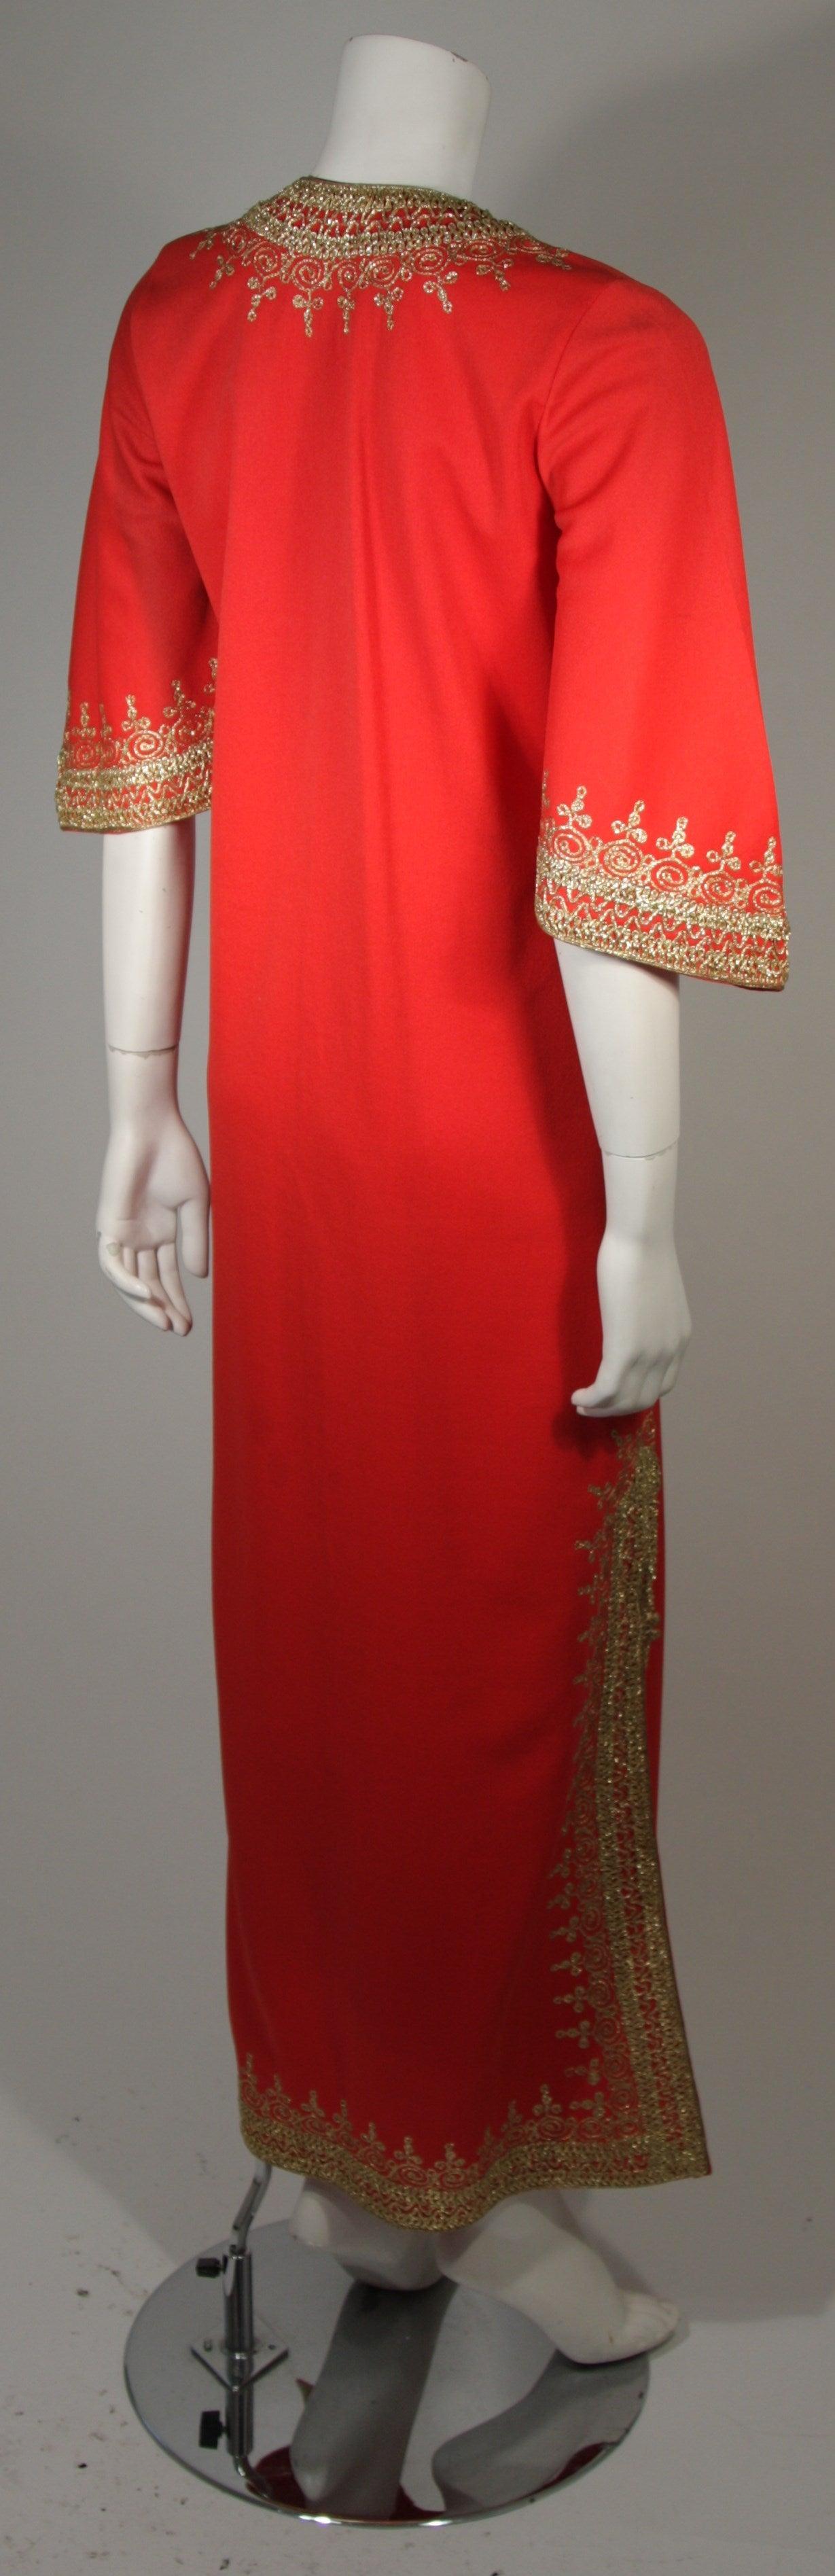 Custom Orange and Gold Indian Kaftan Size Small 6